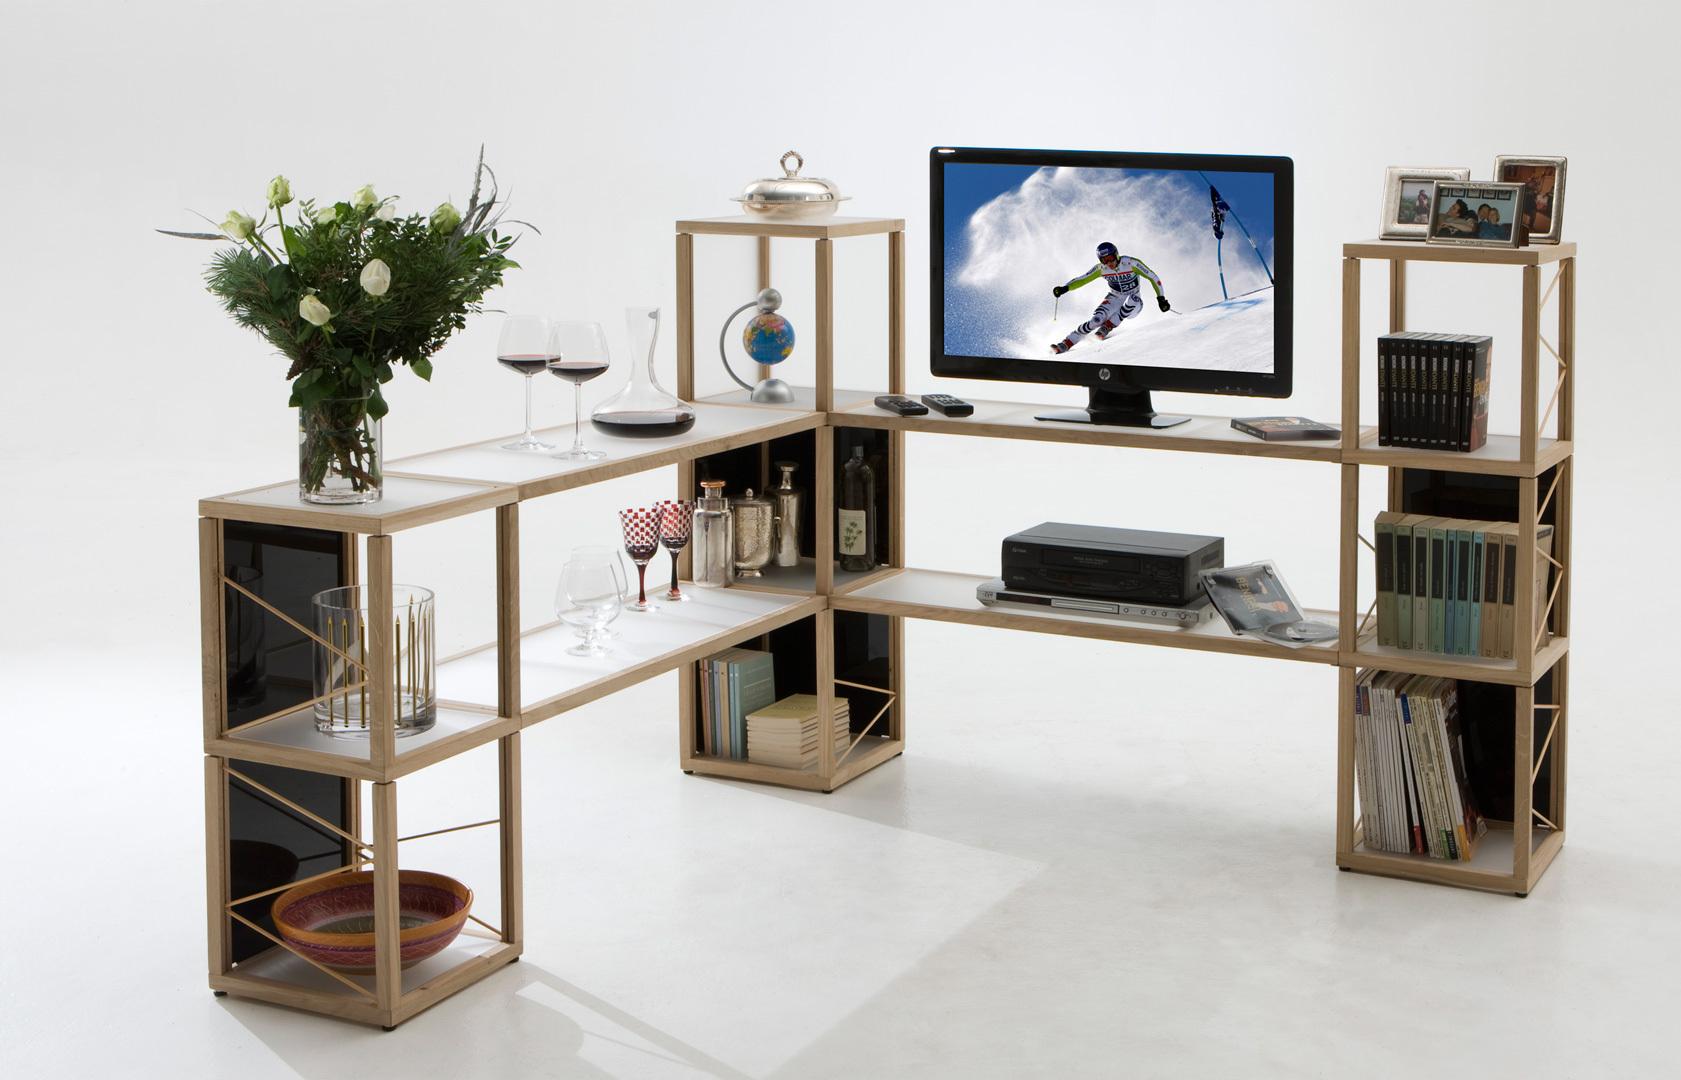 Babele |  modular system | Castle hypothesis 4